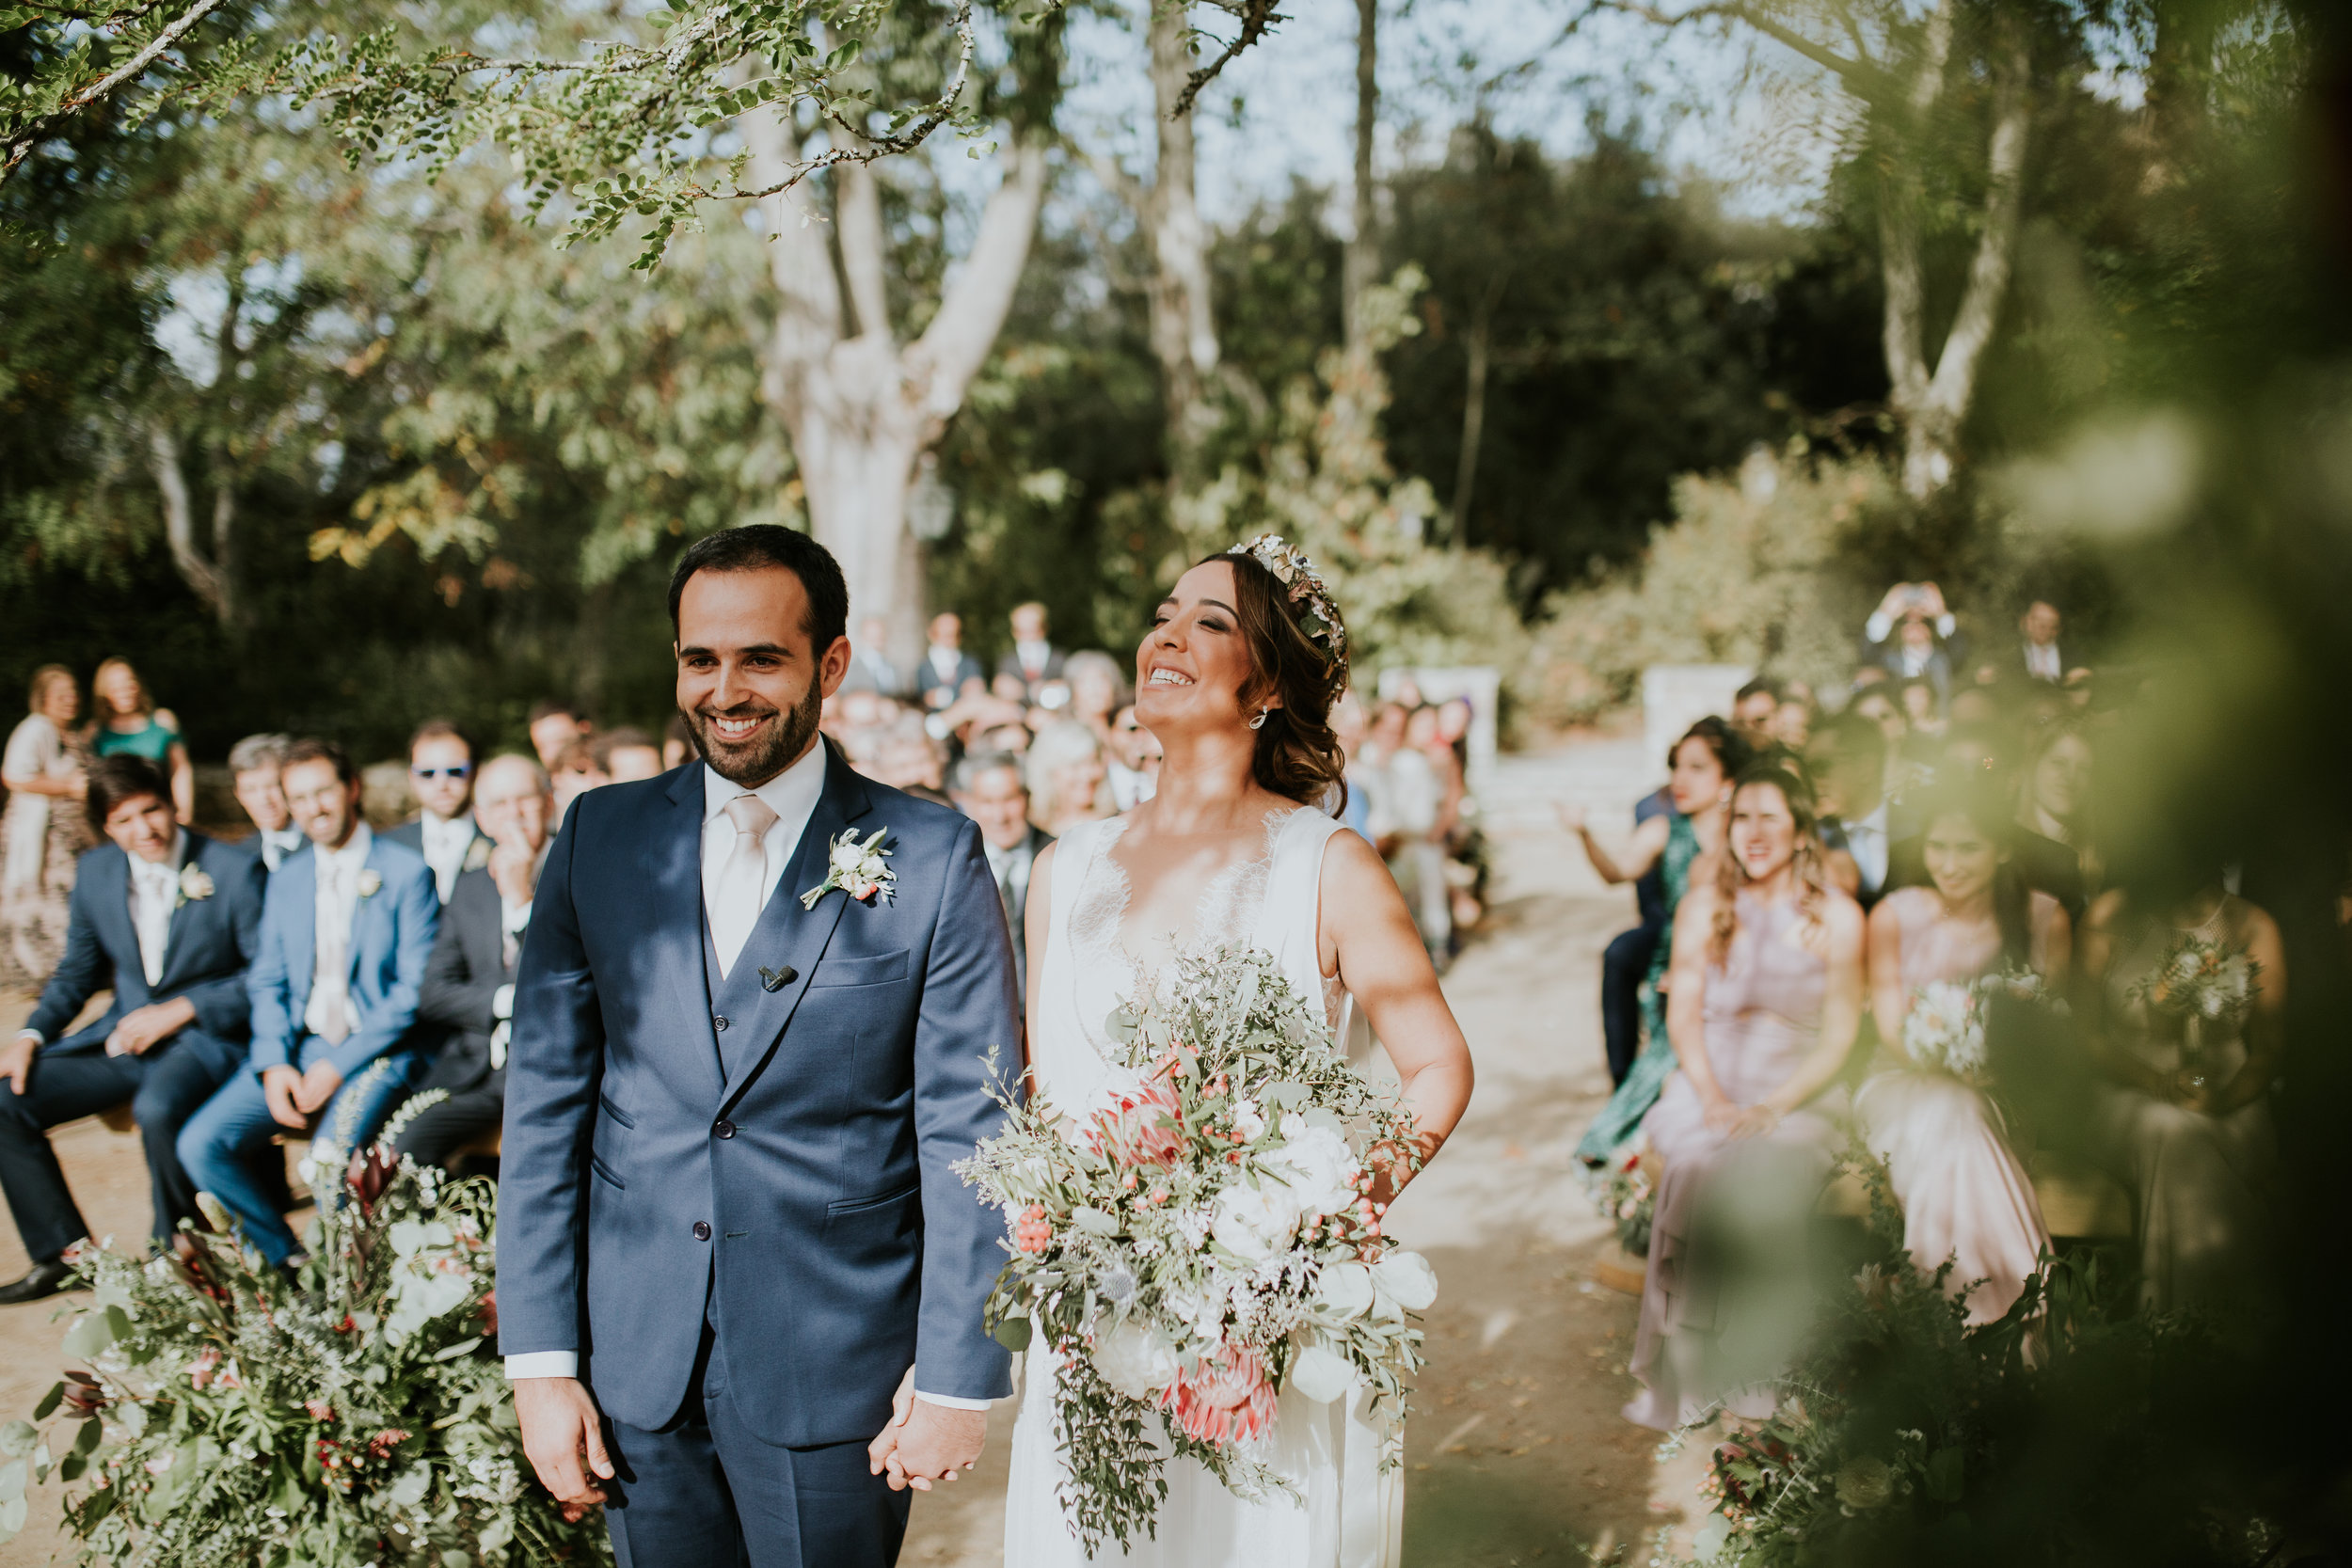 R&J225_ 09 setembro 2017 Wedding day_.jpg